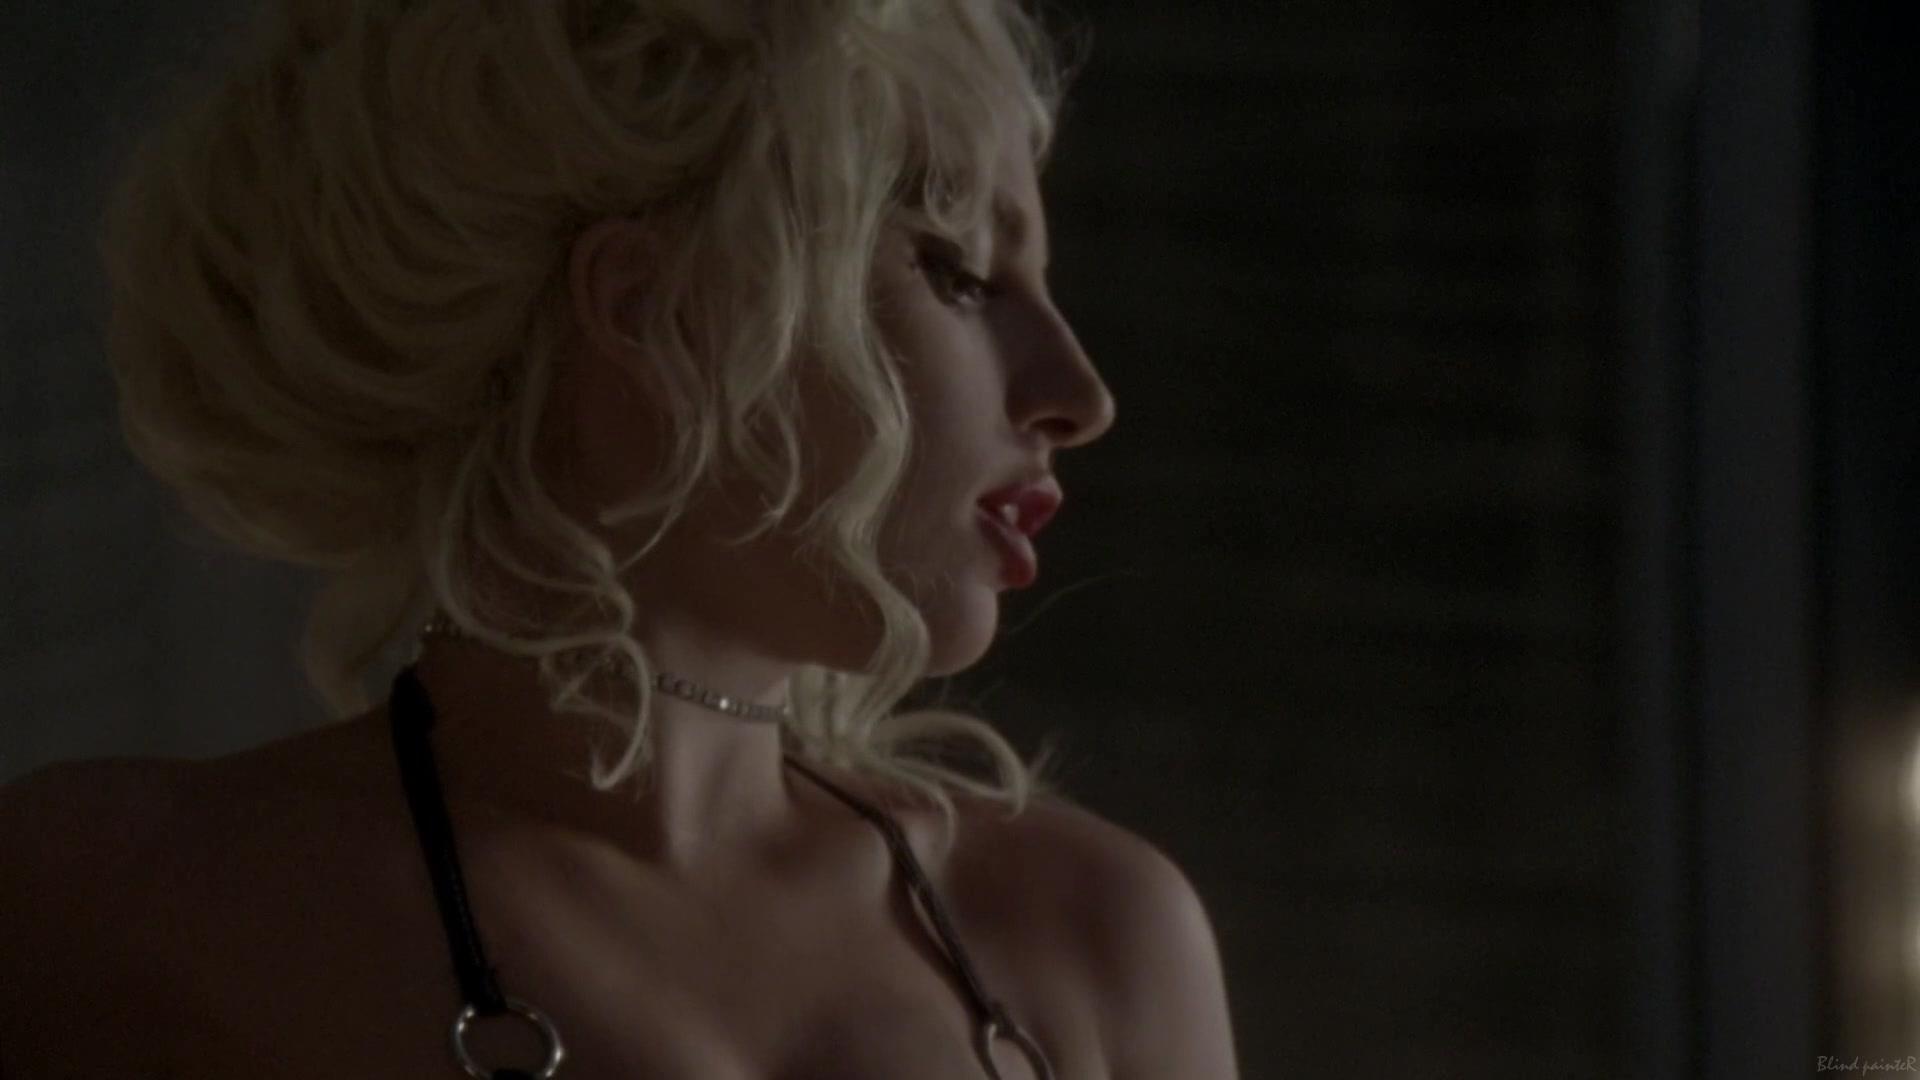 Angela Bassett Nude Pics lady gaga & angela bassett nude - american horror story